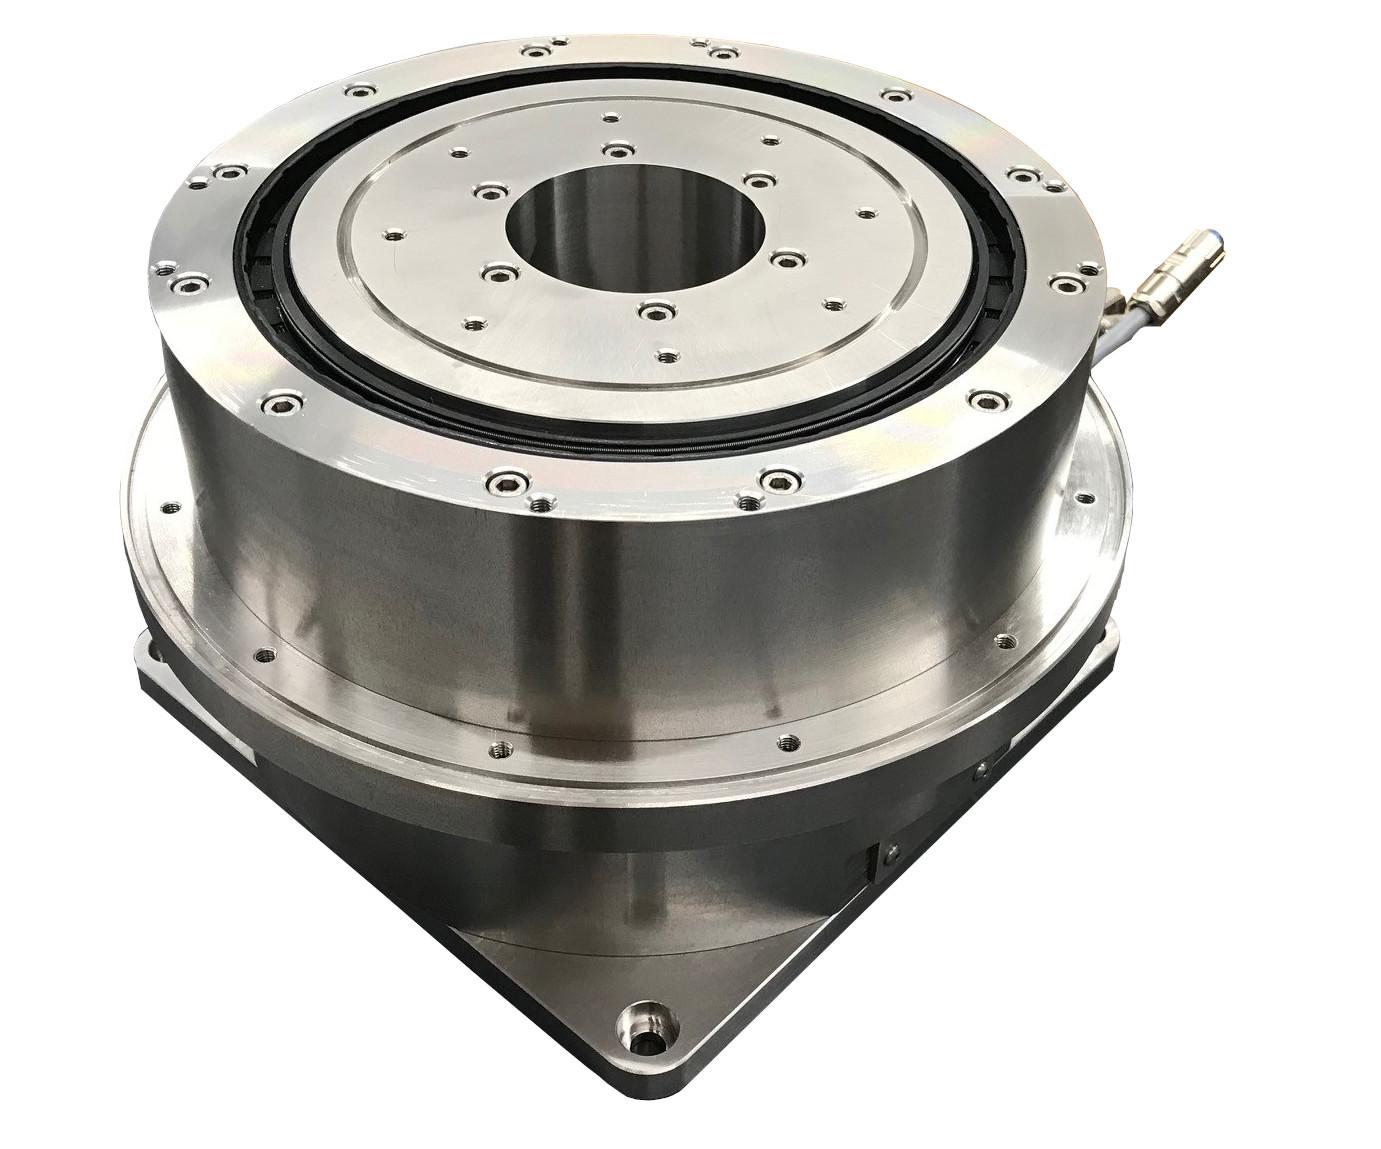 Mechanical bearing rotary table